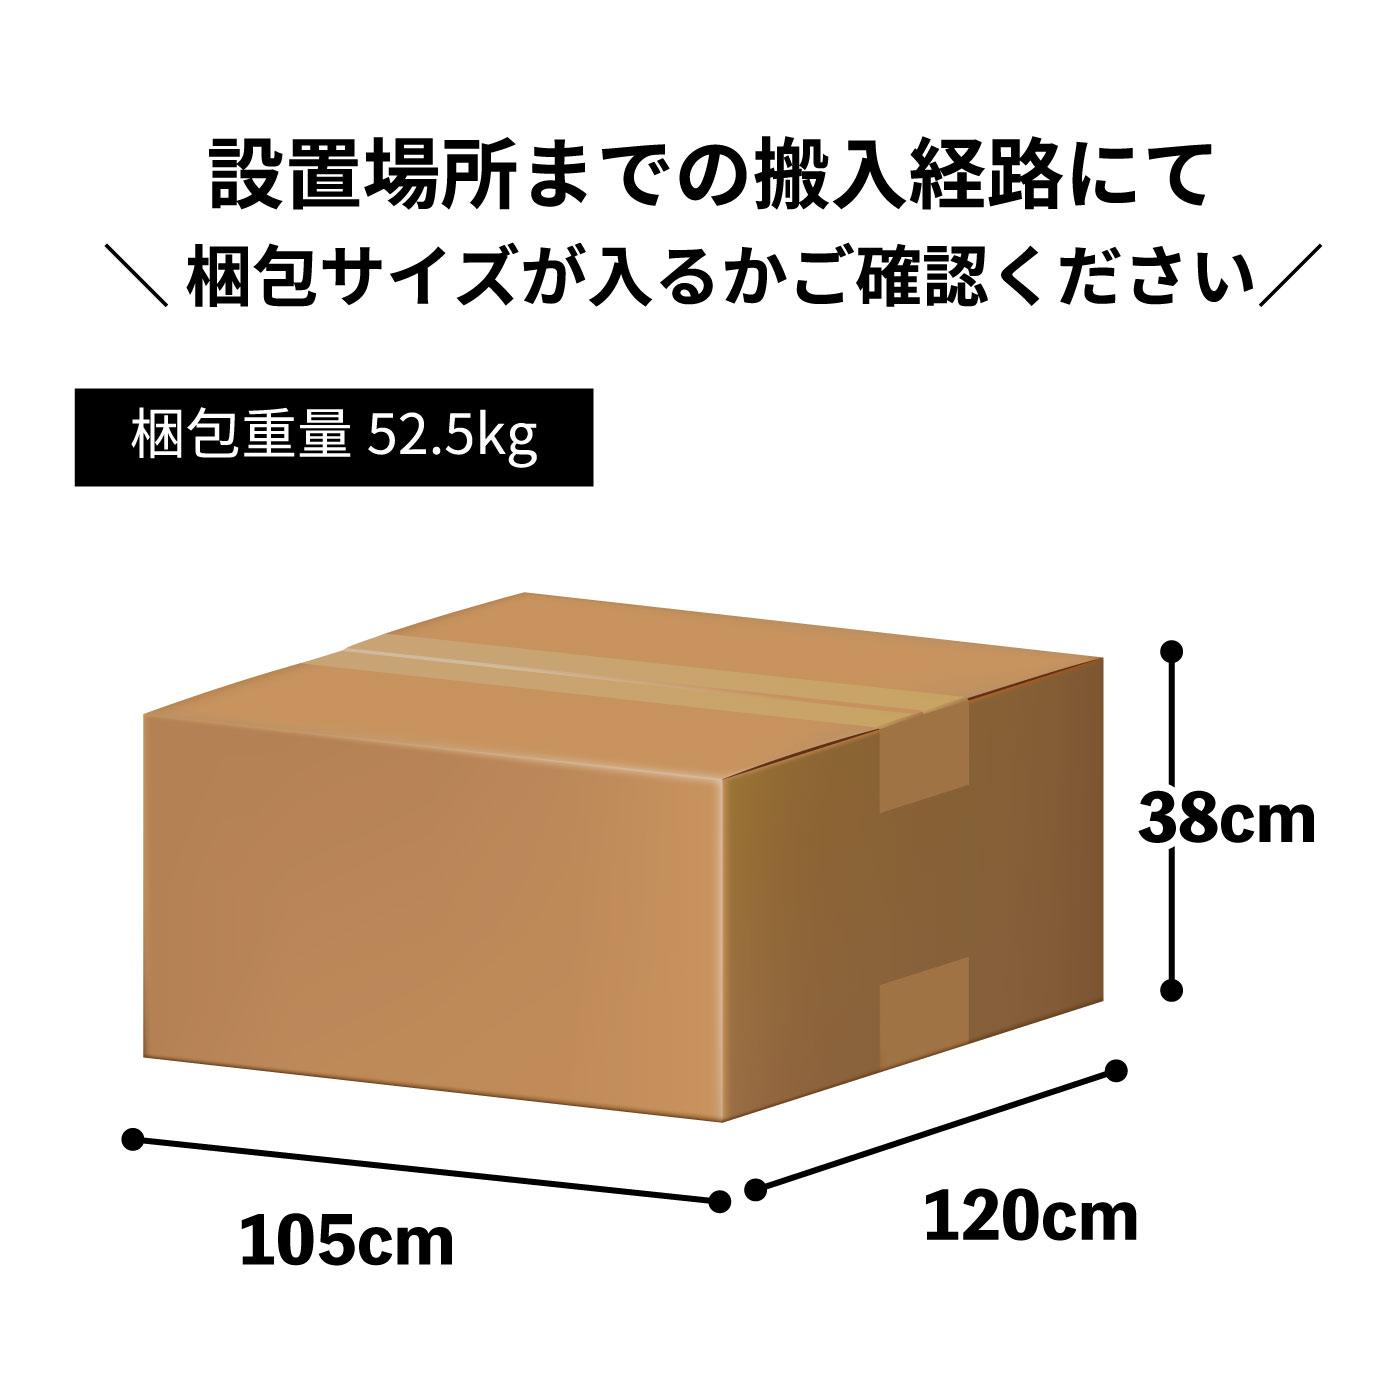 DK-1201の梱包サイズ